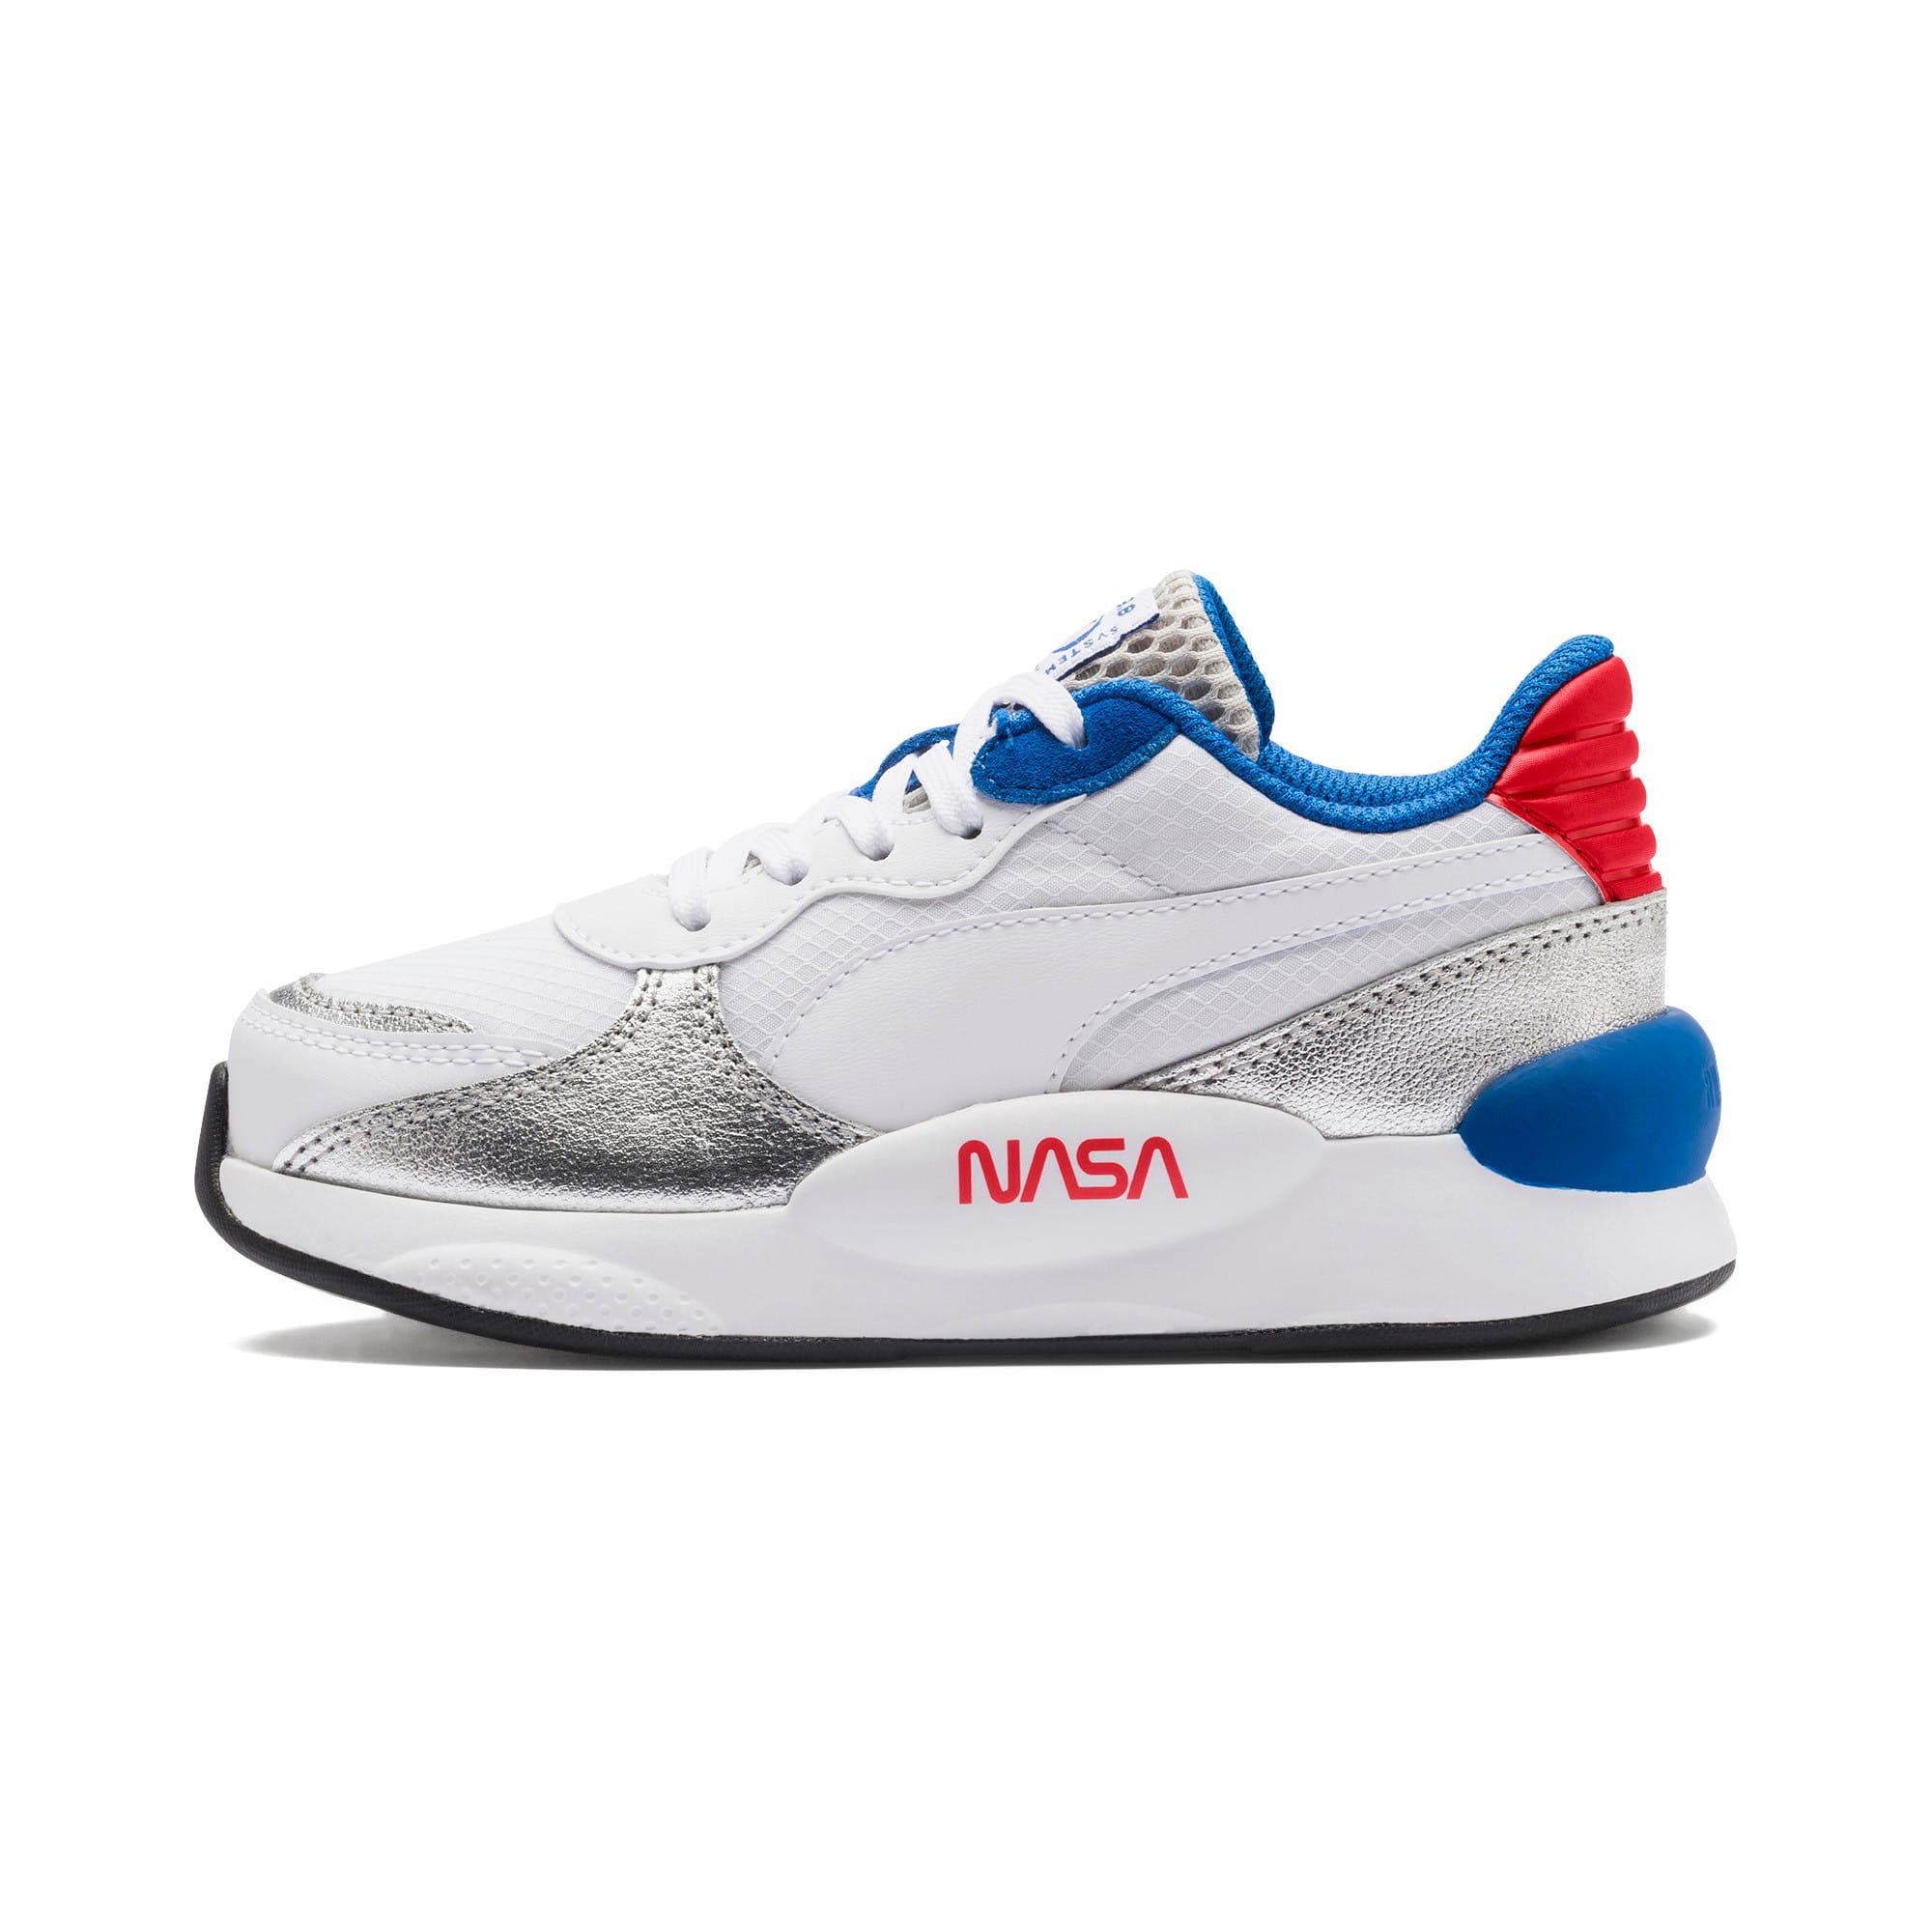 Thumbnail 1 of RS 9.8 Space Agency Little Kids' Shoes, Puma White-Puma Silver, medium